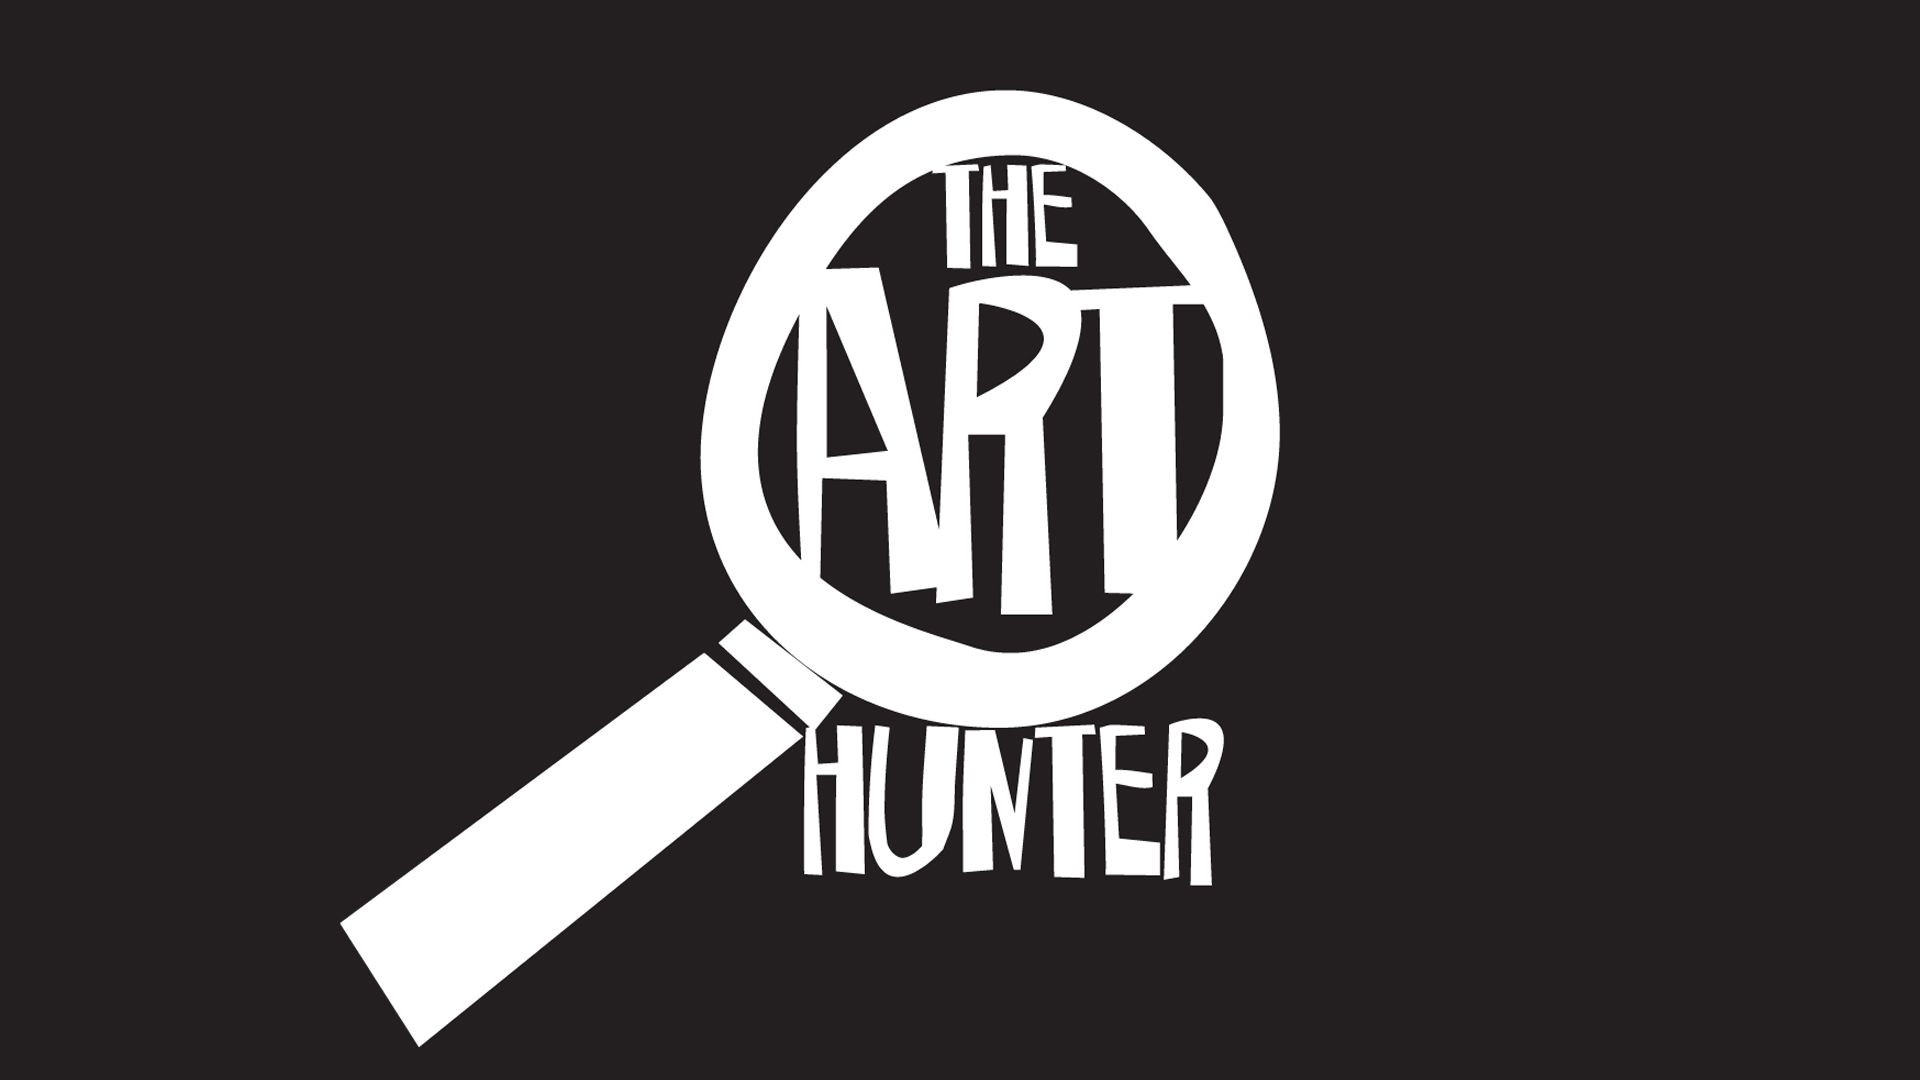 The Art Hunter